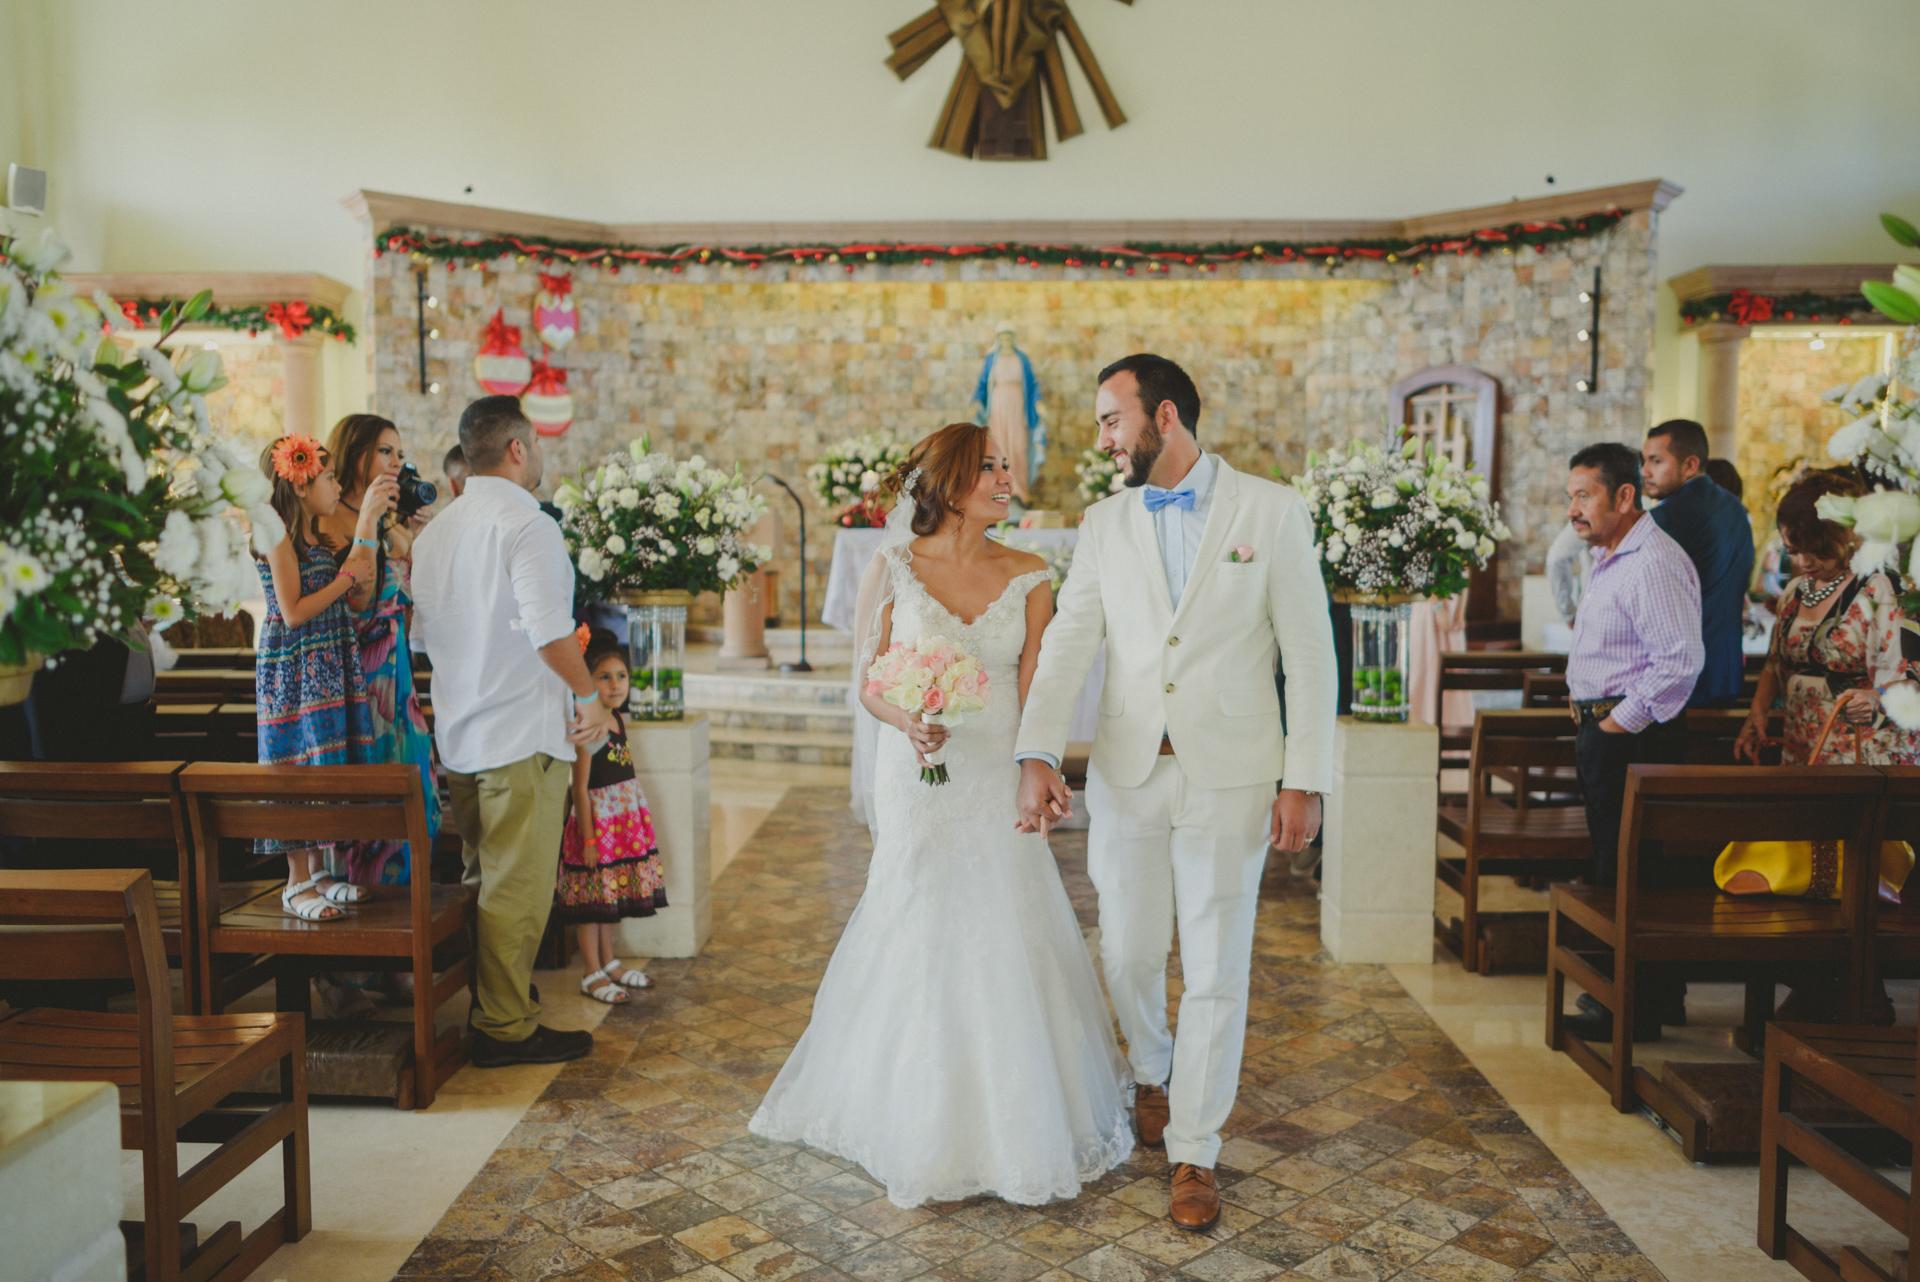 Wedding N&M BLOG luishoudin.com (68 de 174)